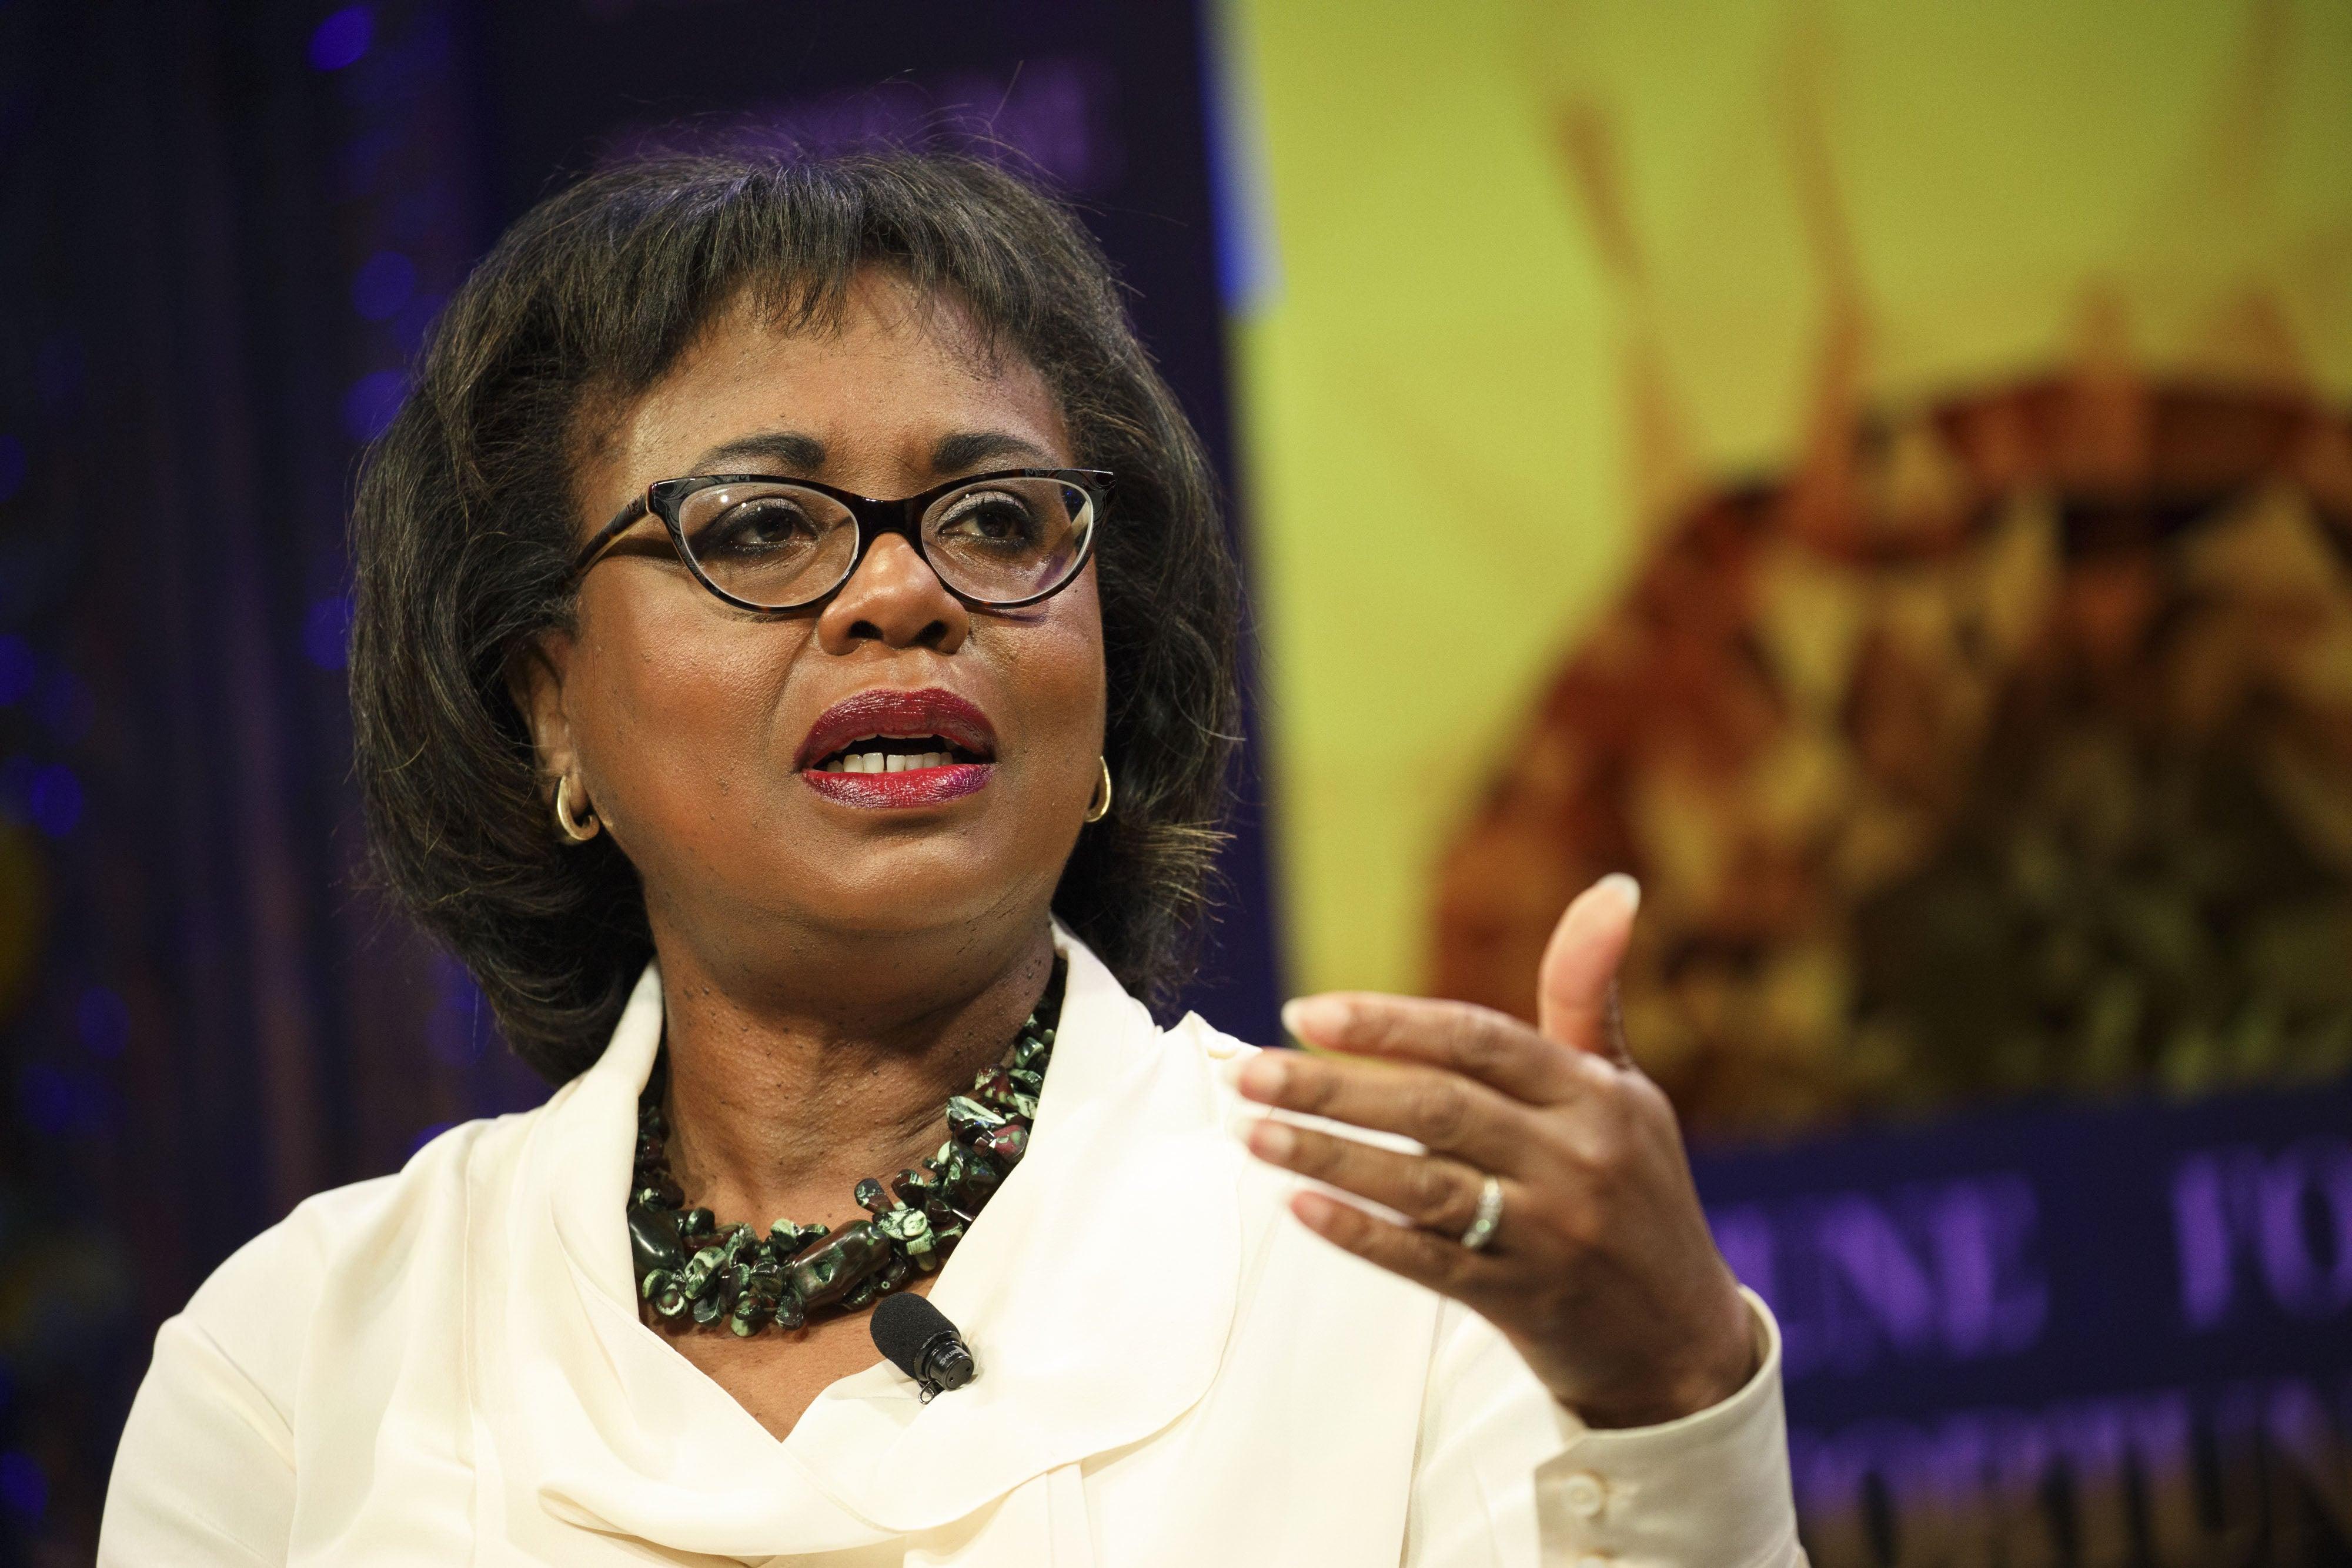 Anita Hill Calls Out Kavanaugh's Behavior During Testimony